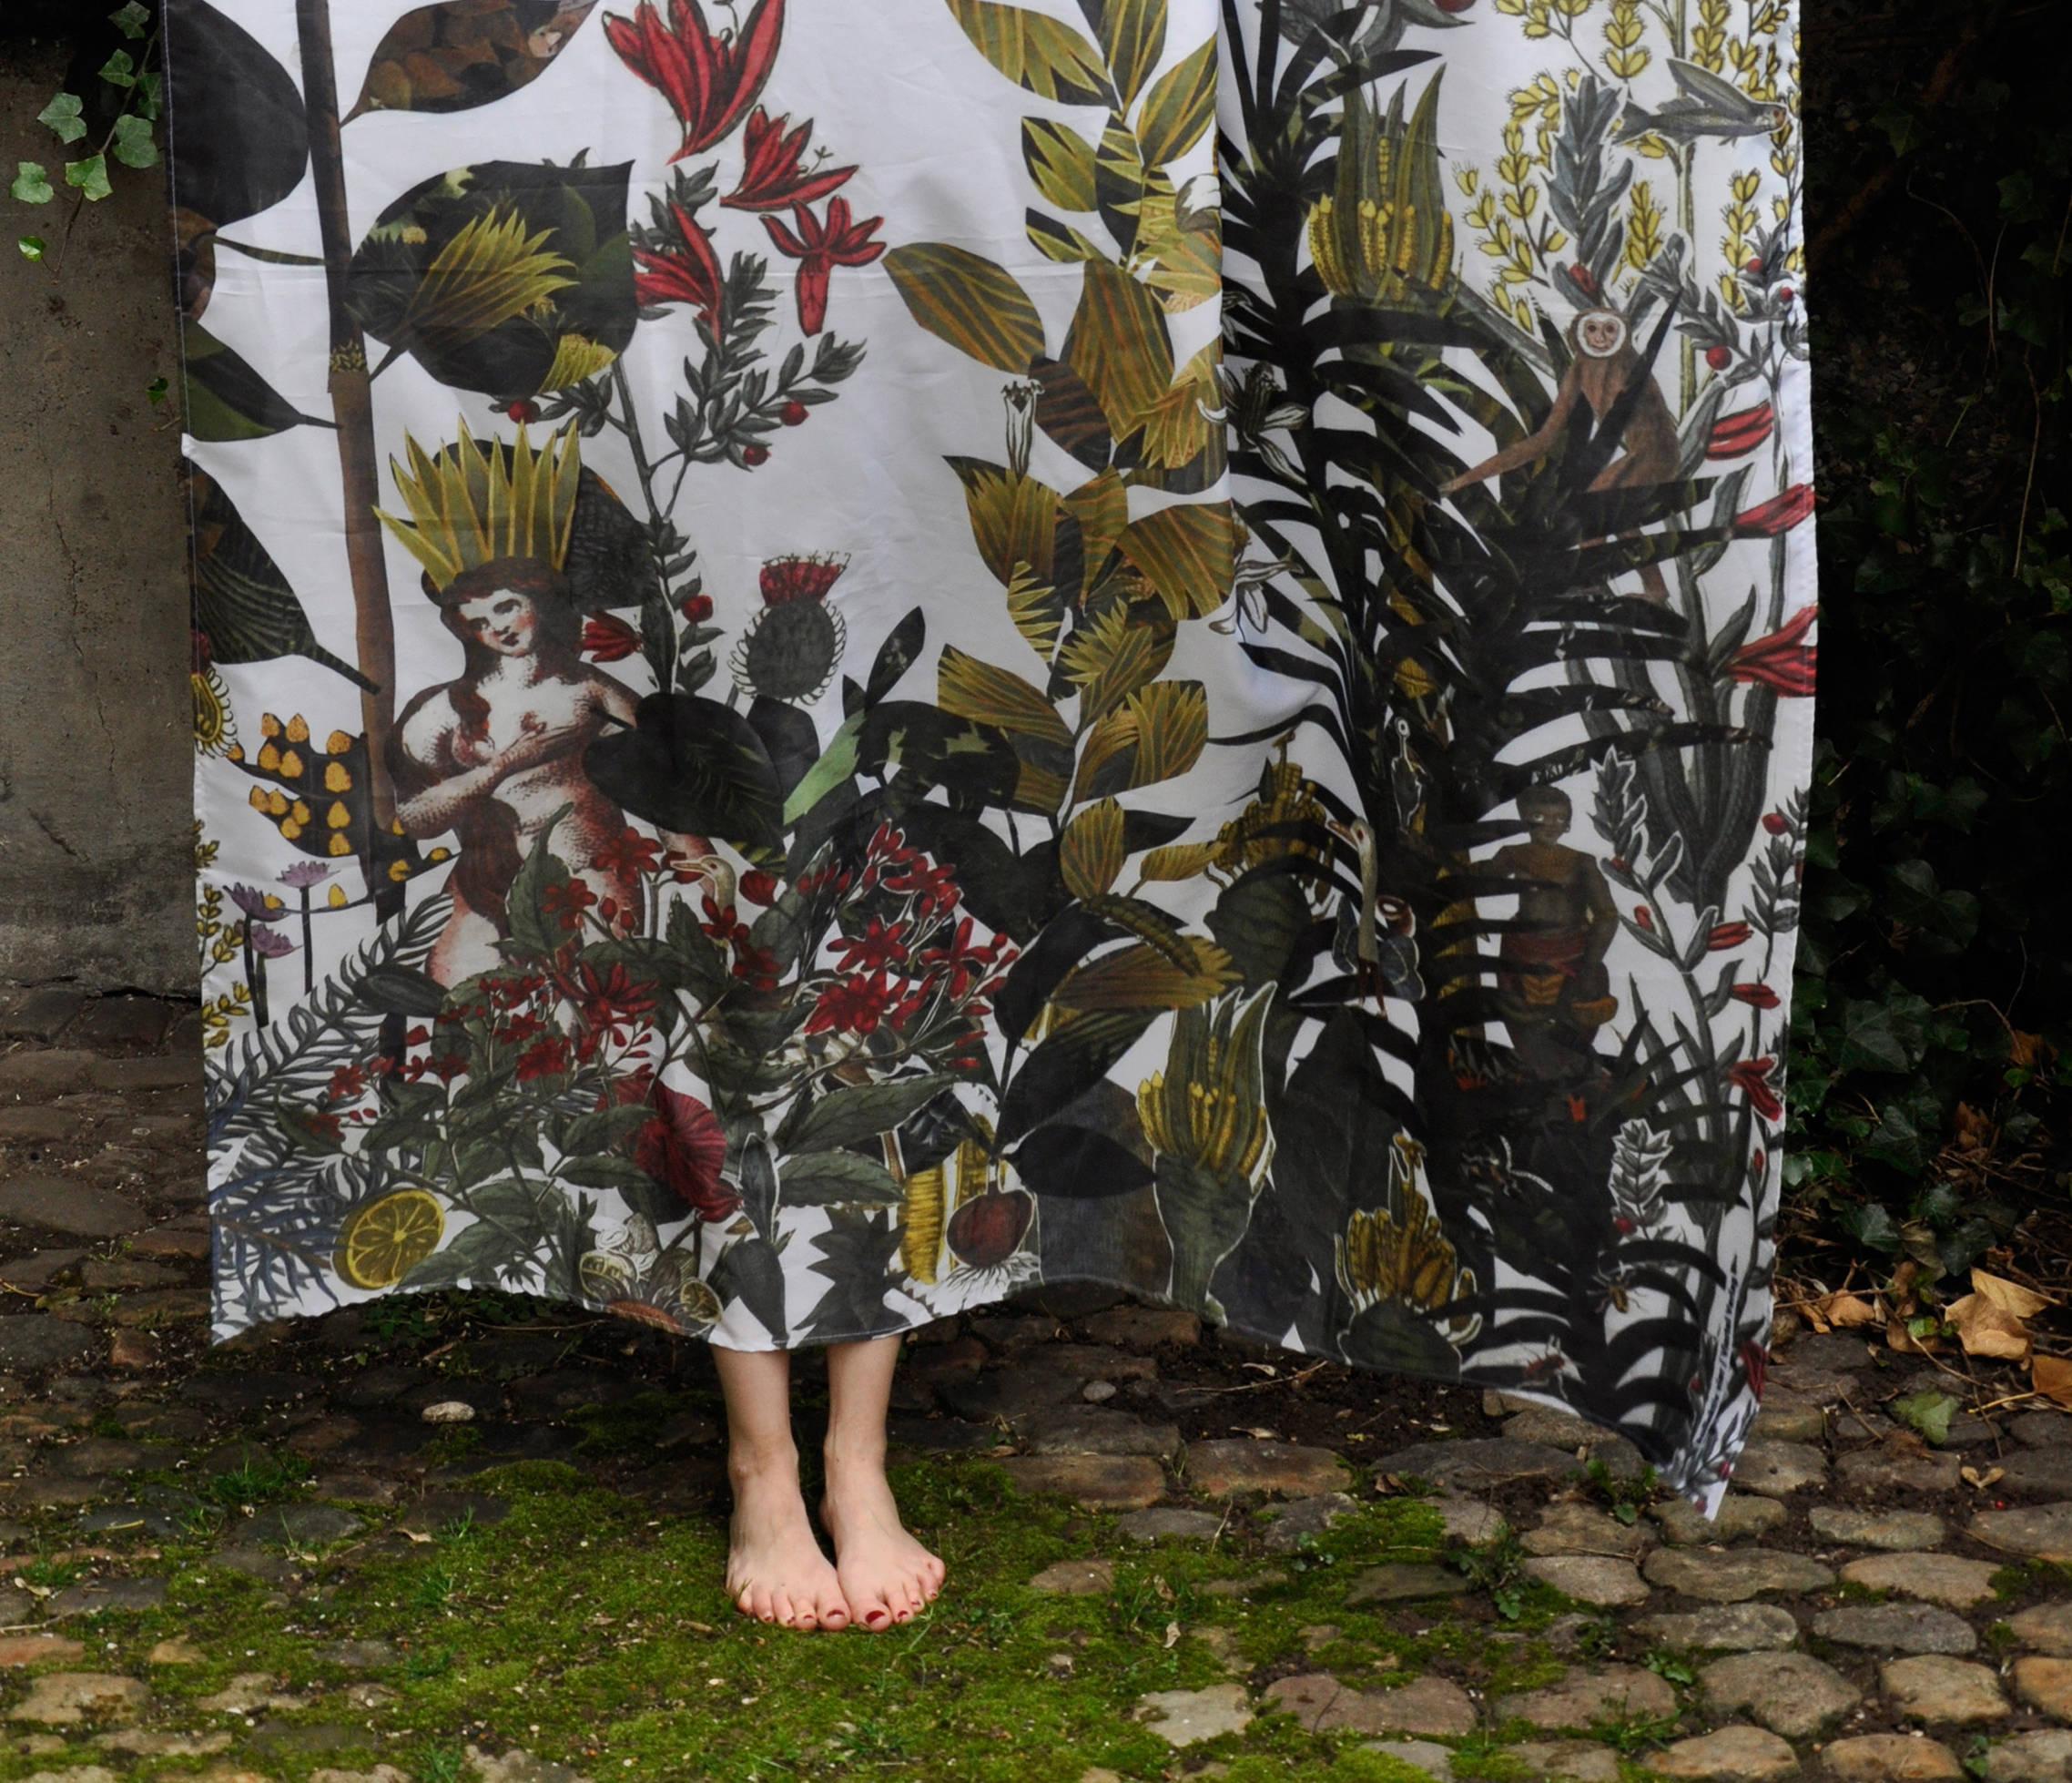 kollektiv vier—Surface and Textile Design